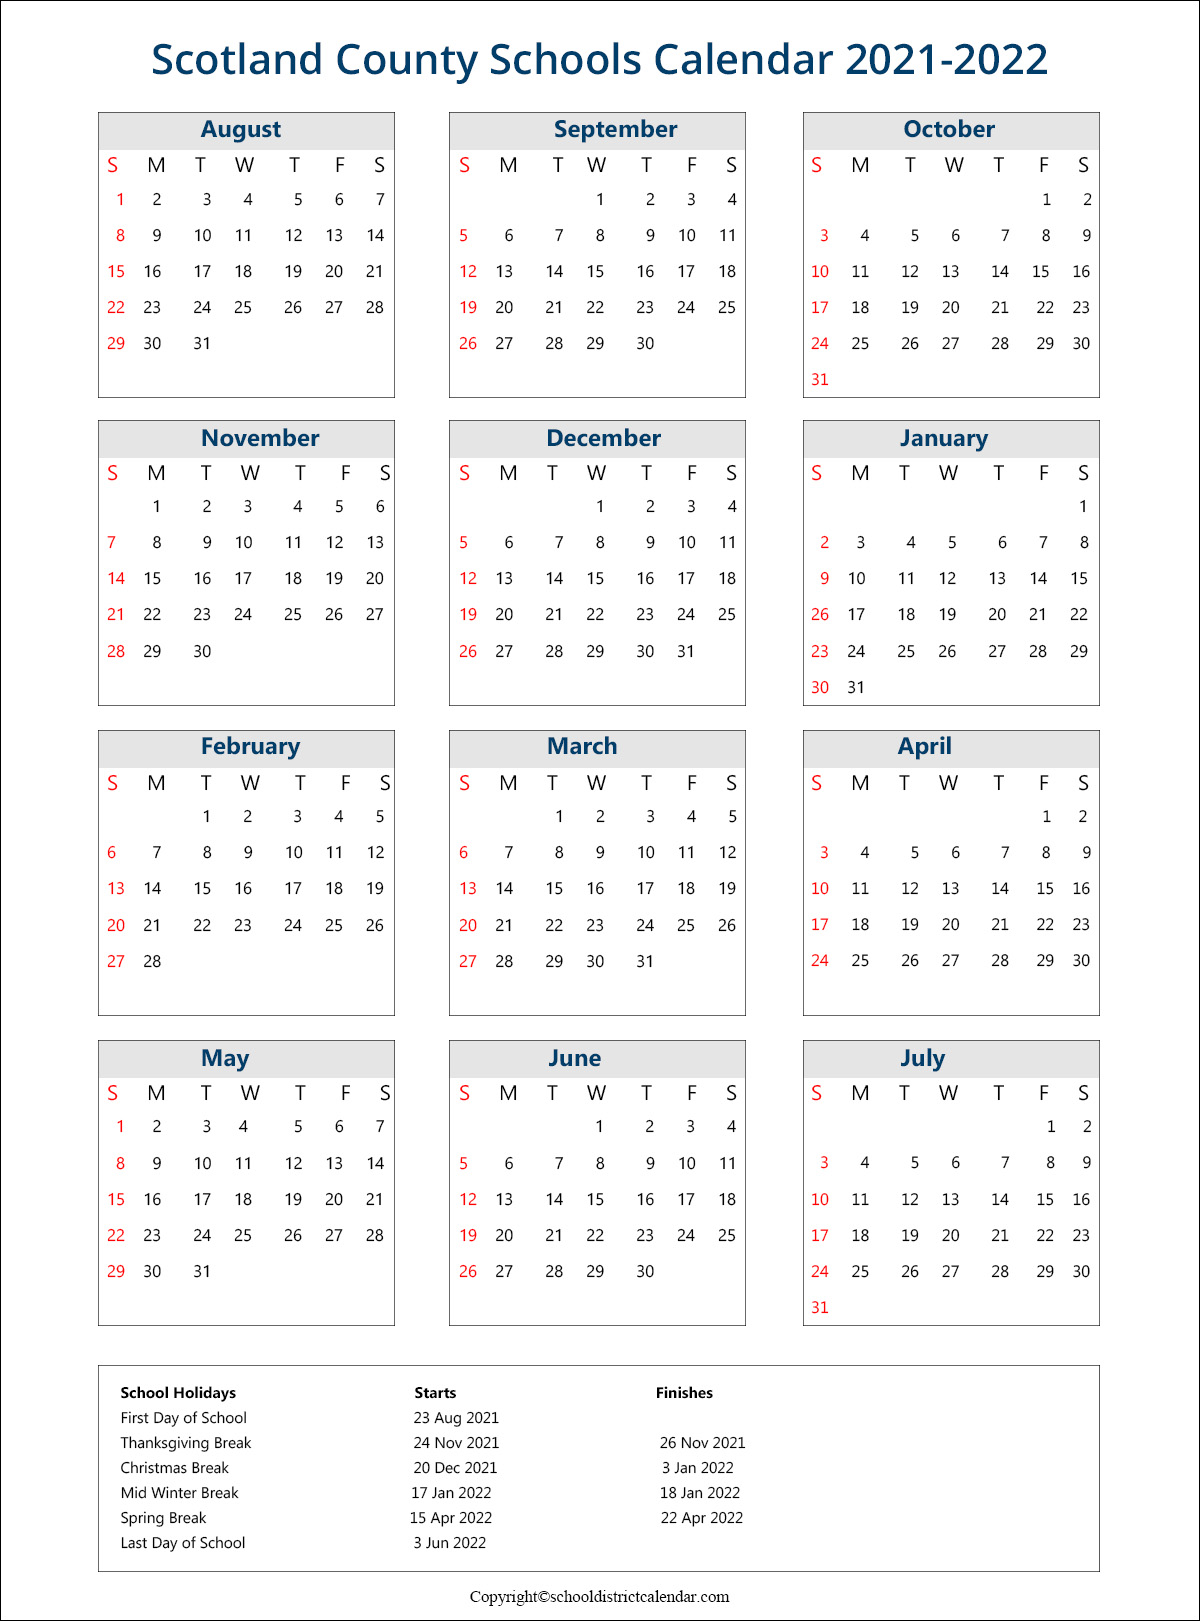 Scotland County Schools Calendar 2021